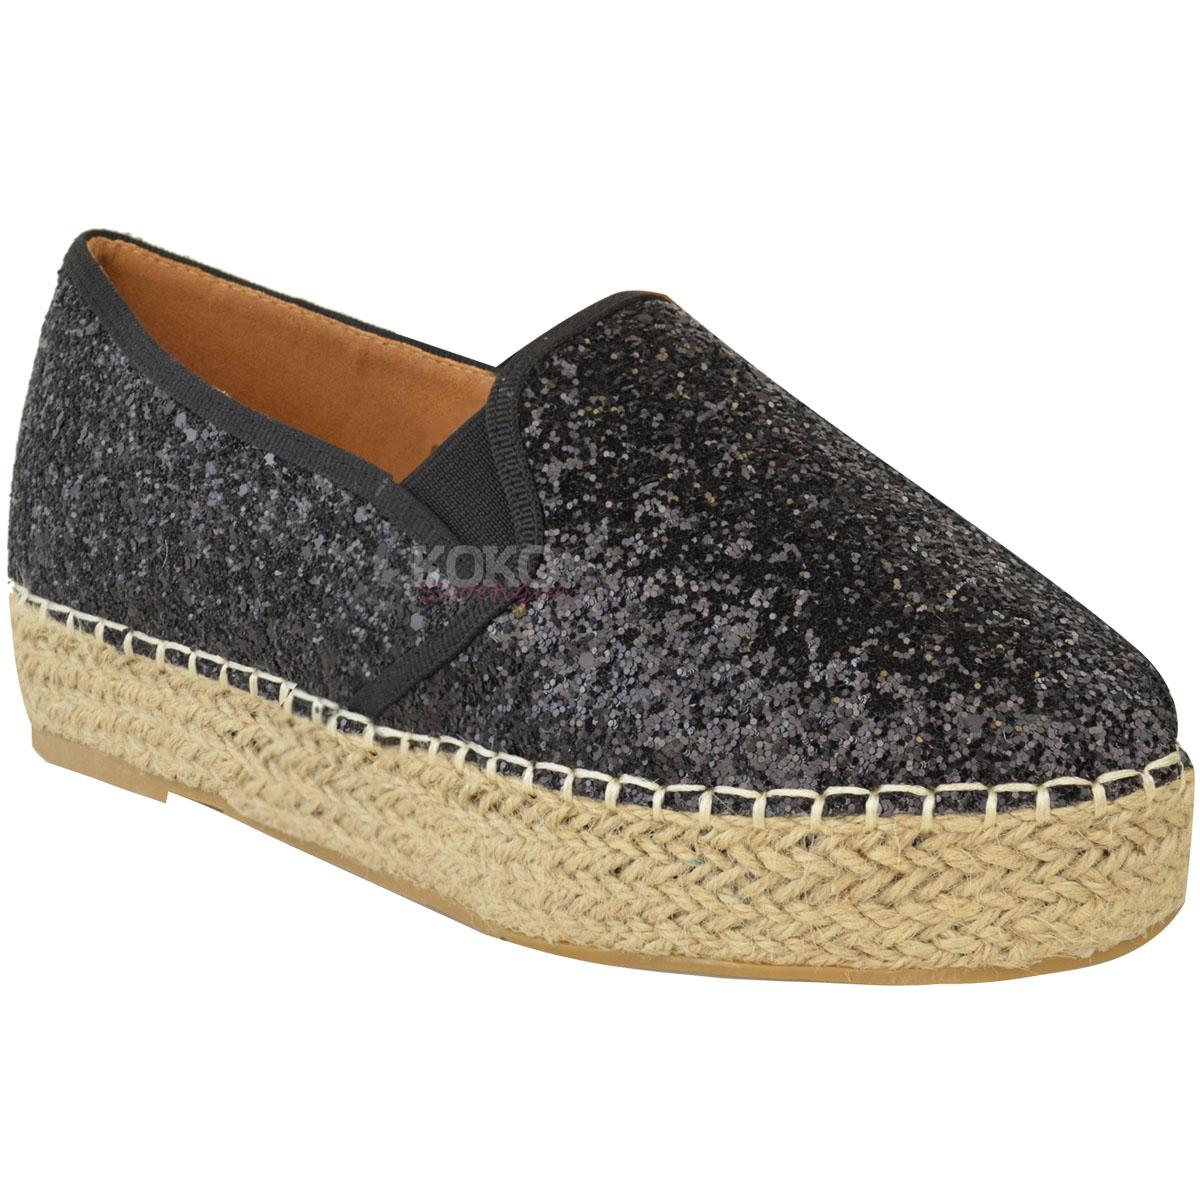 cc2880afb Womens Ladies Flat Espadrilles Low Wedge Slip On Glitter Platforms ...